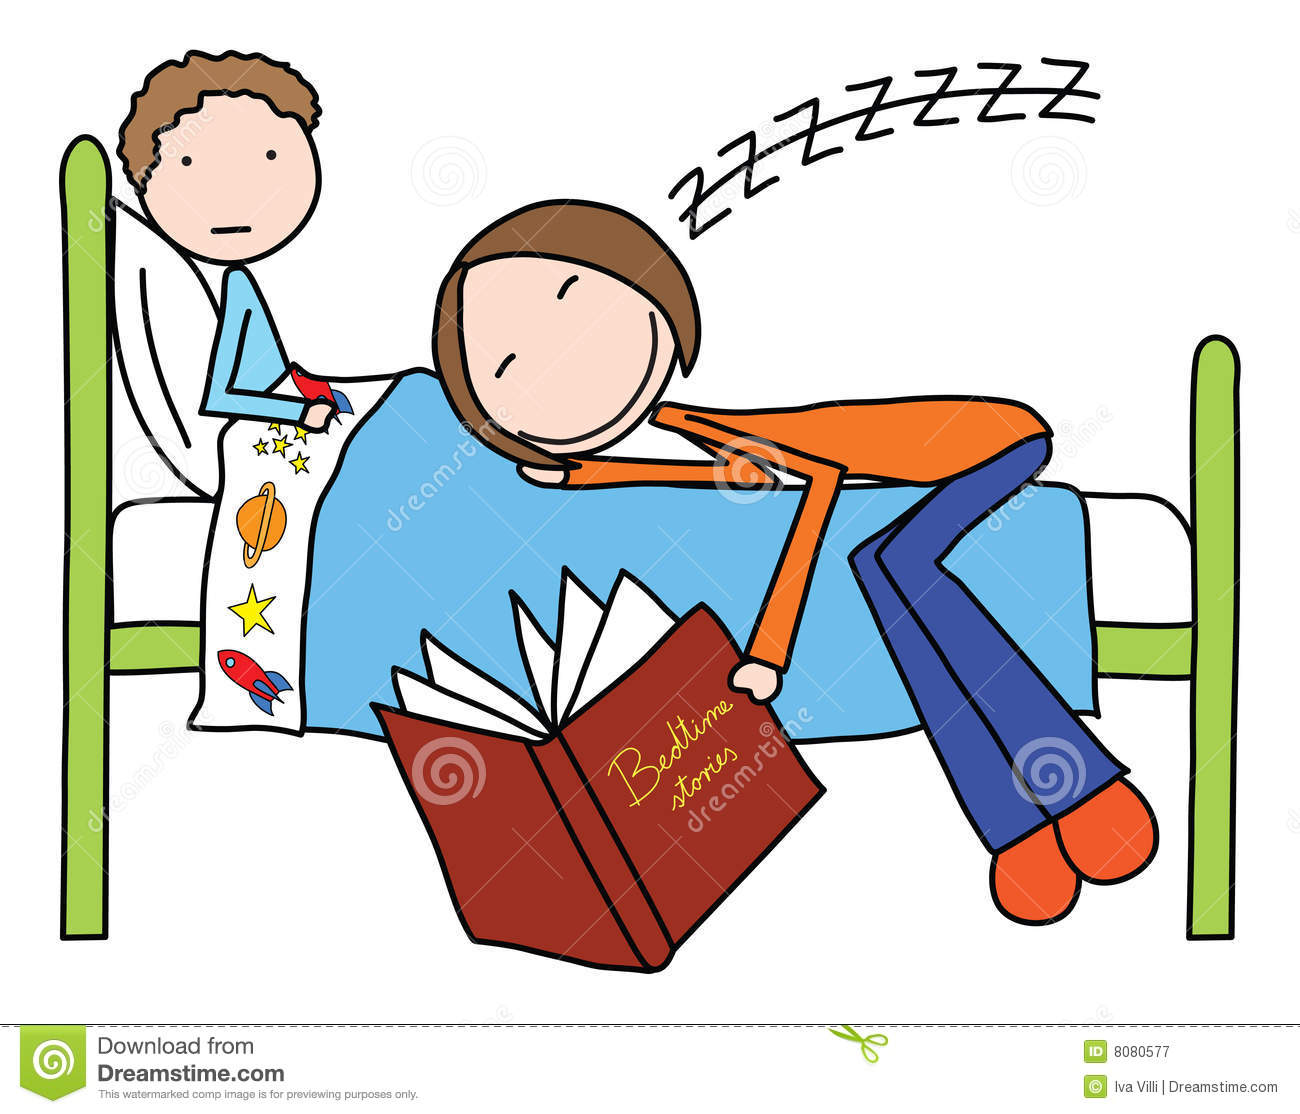 Bedtime story clip art free.